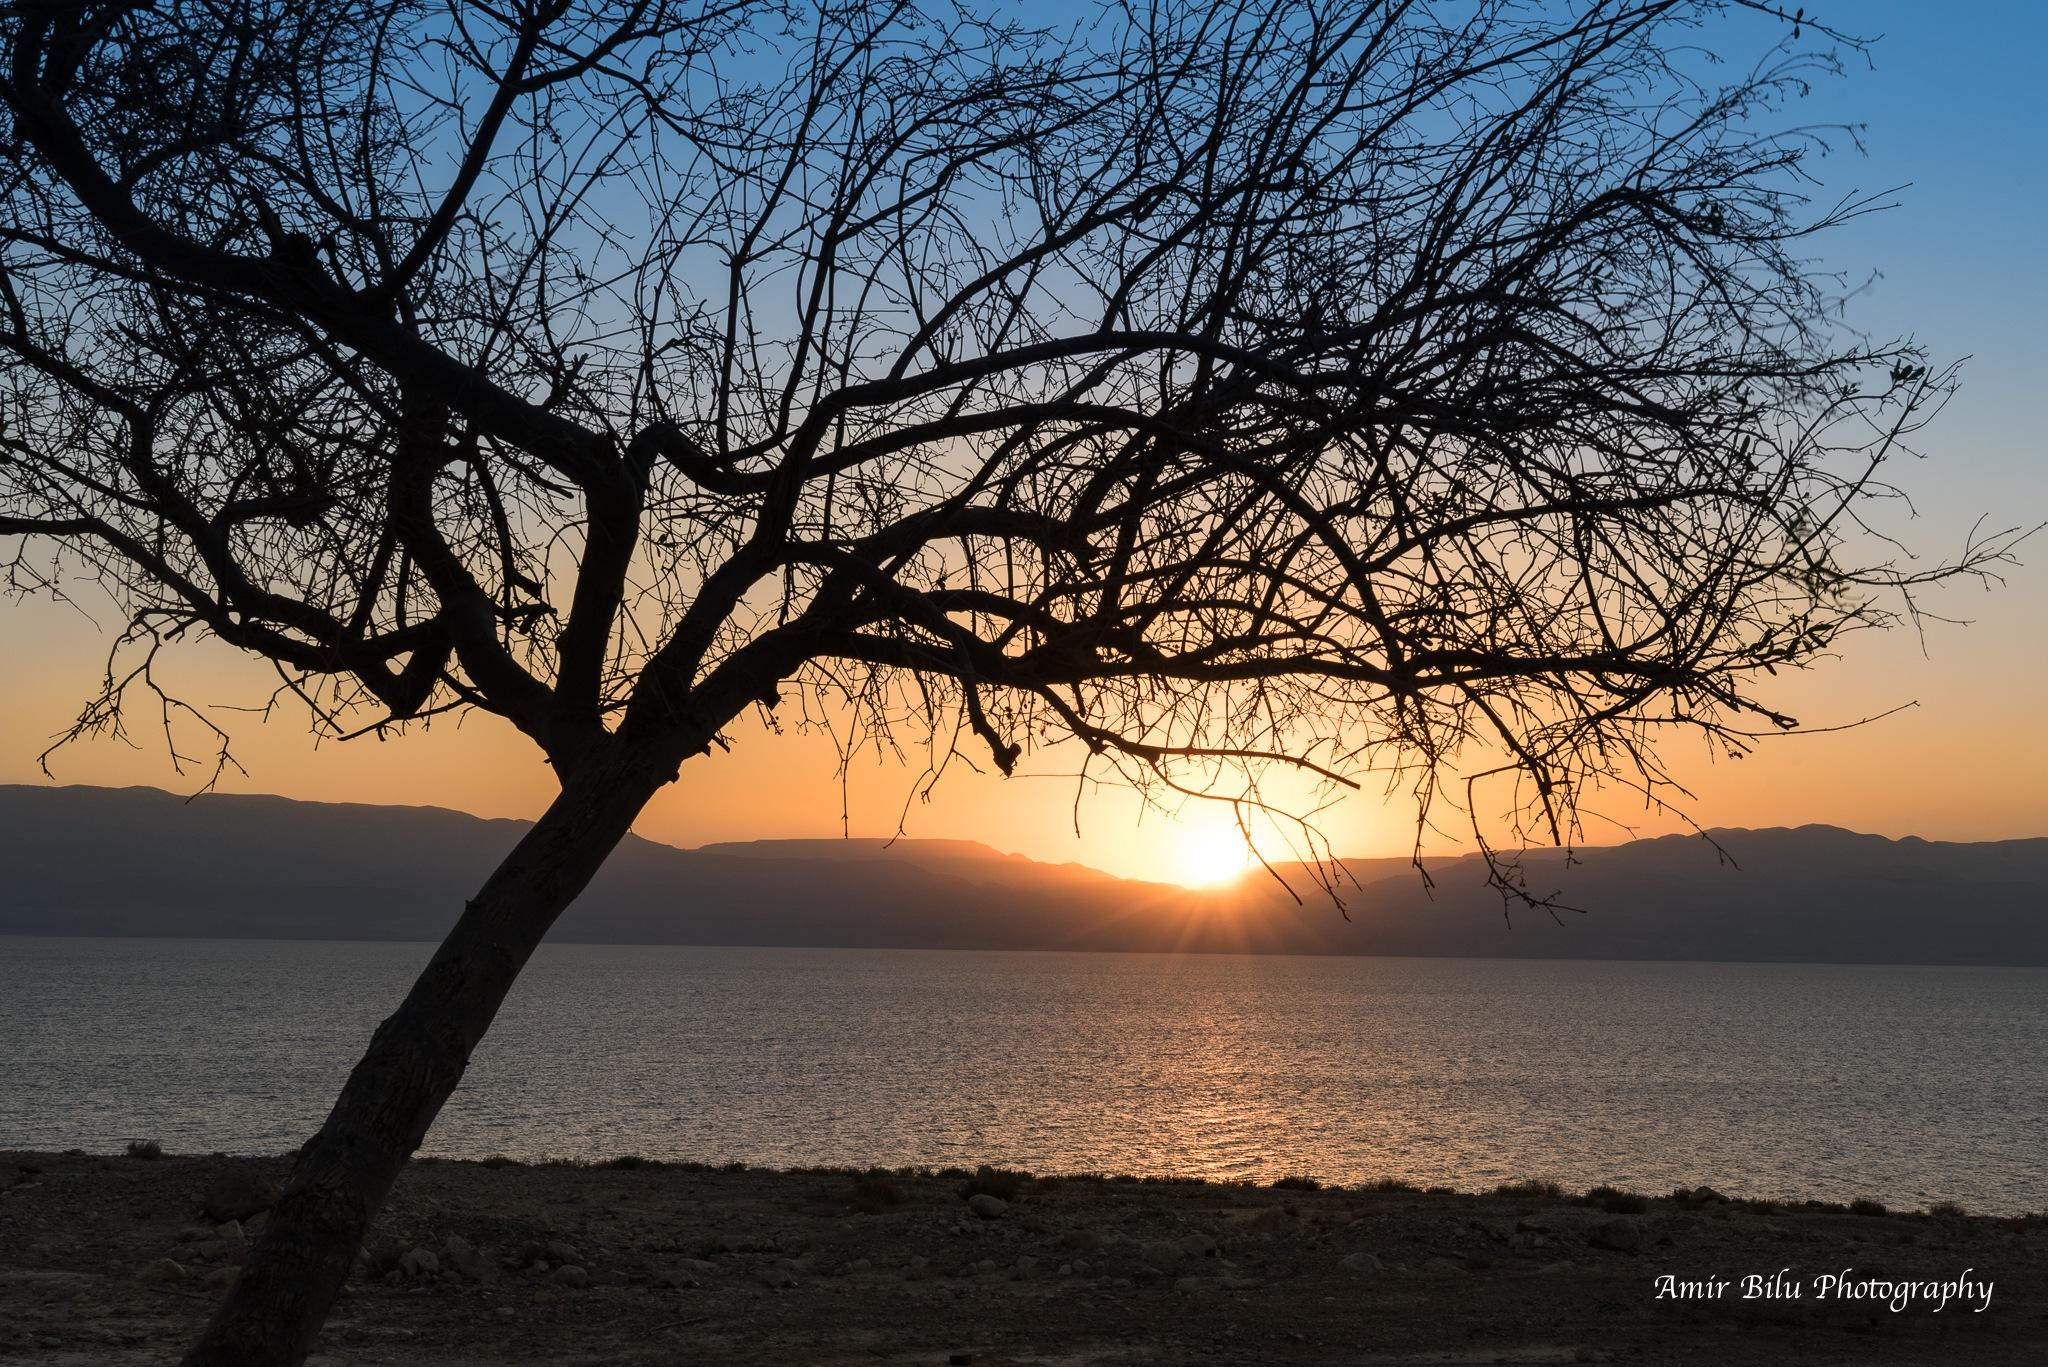 Sunrise at the Dead Sea by Amir Bilu